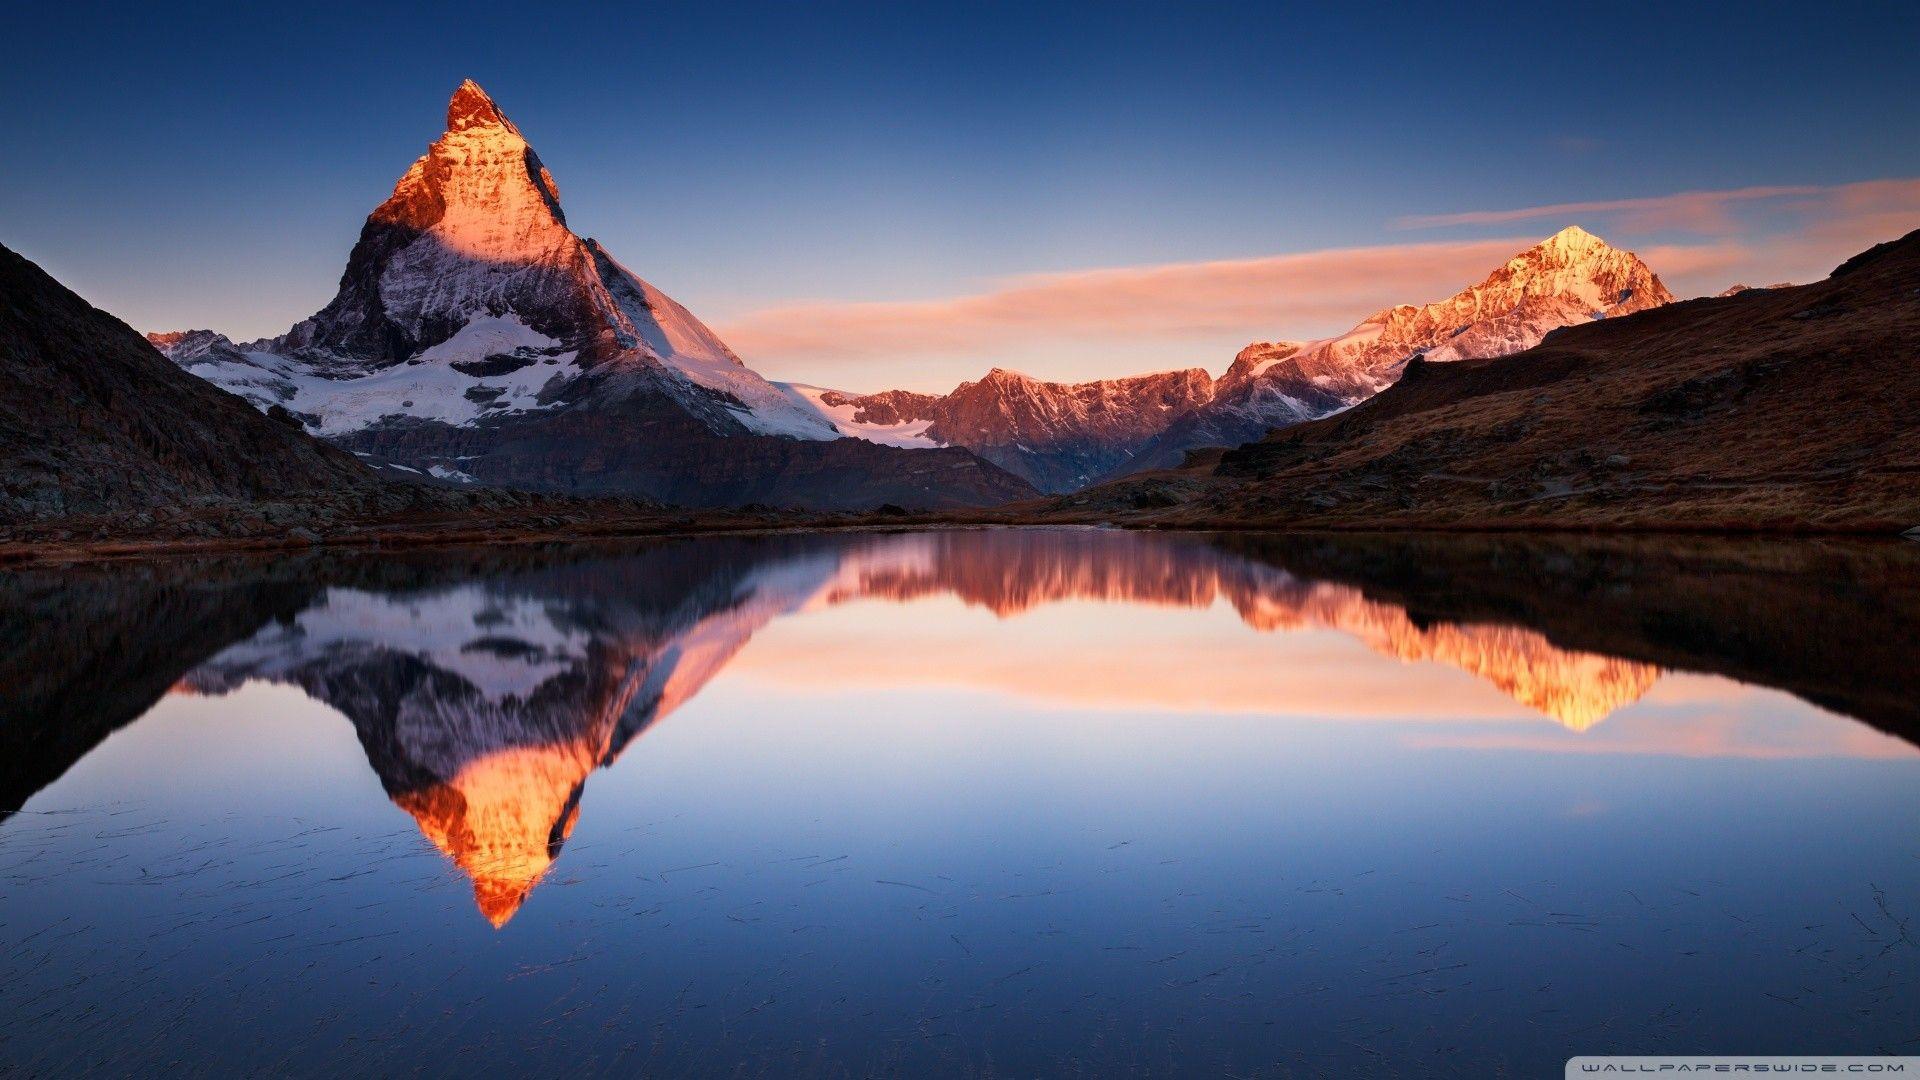 1920x1080 Hd Mountain Wallpapers Top Free 1920x1080 Hd Mountain Backgrounds Wallpaperaccess